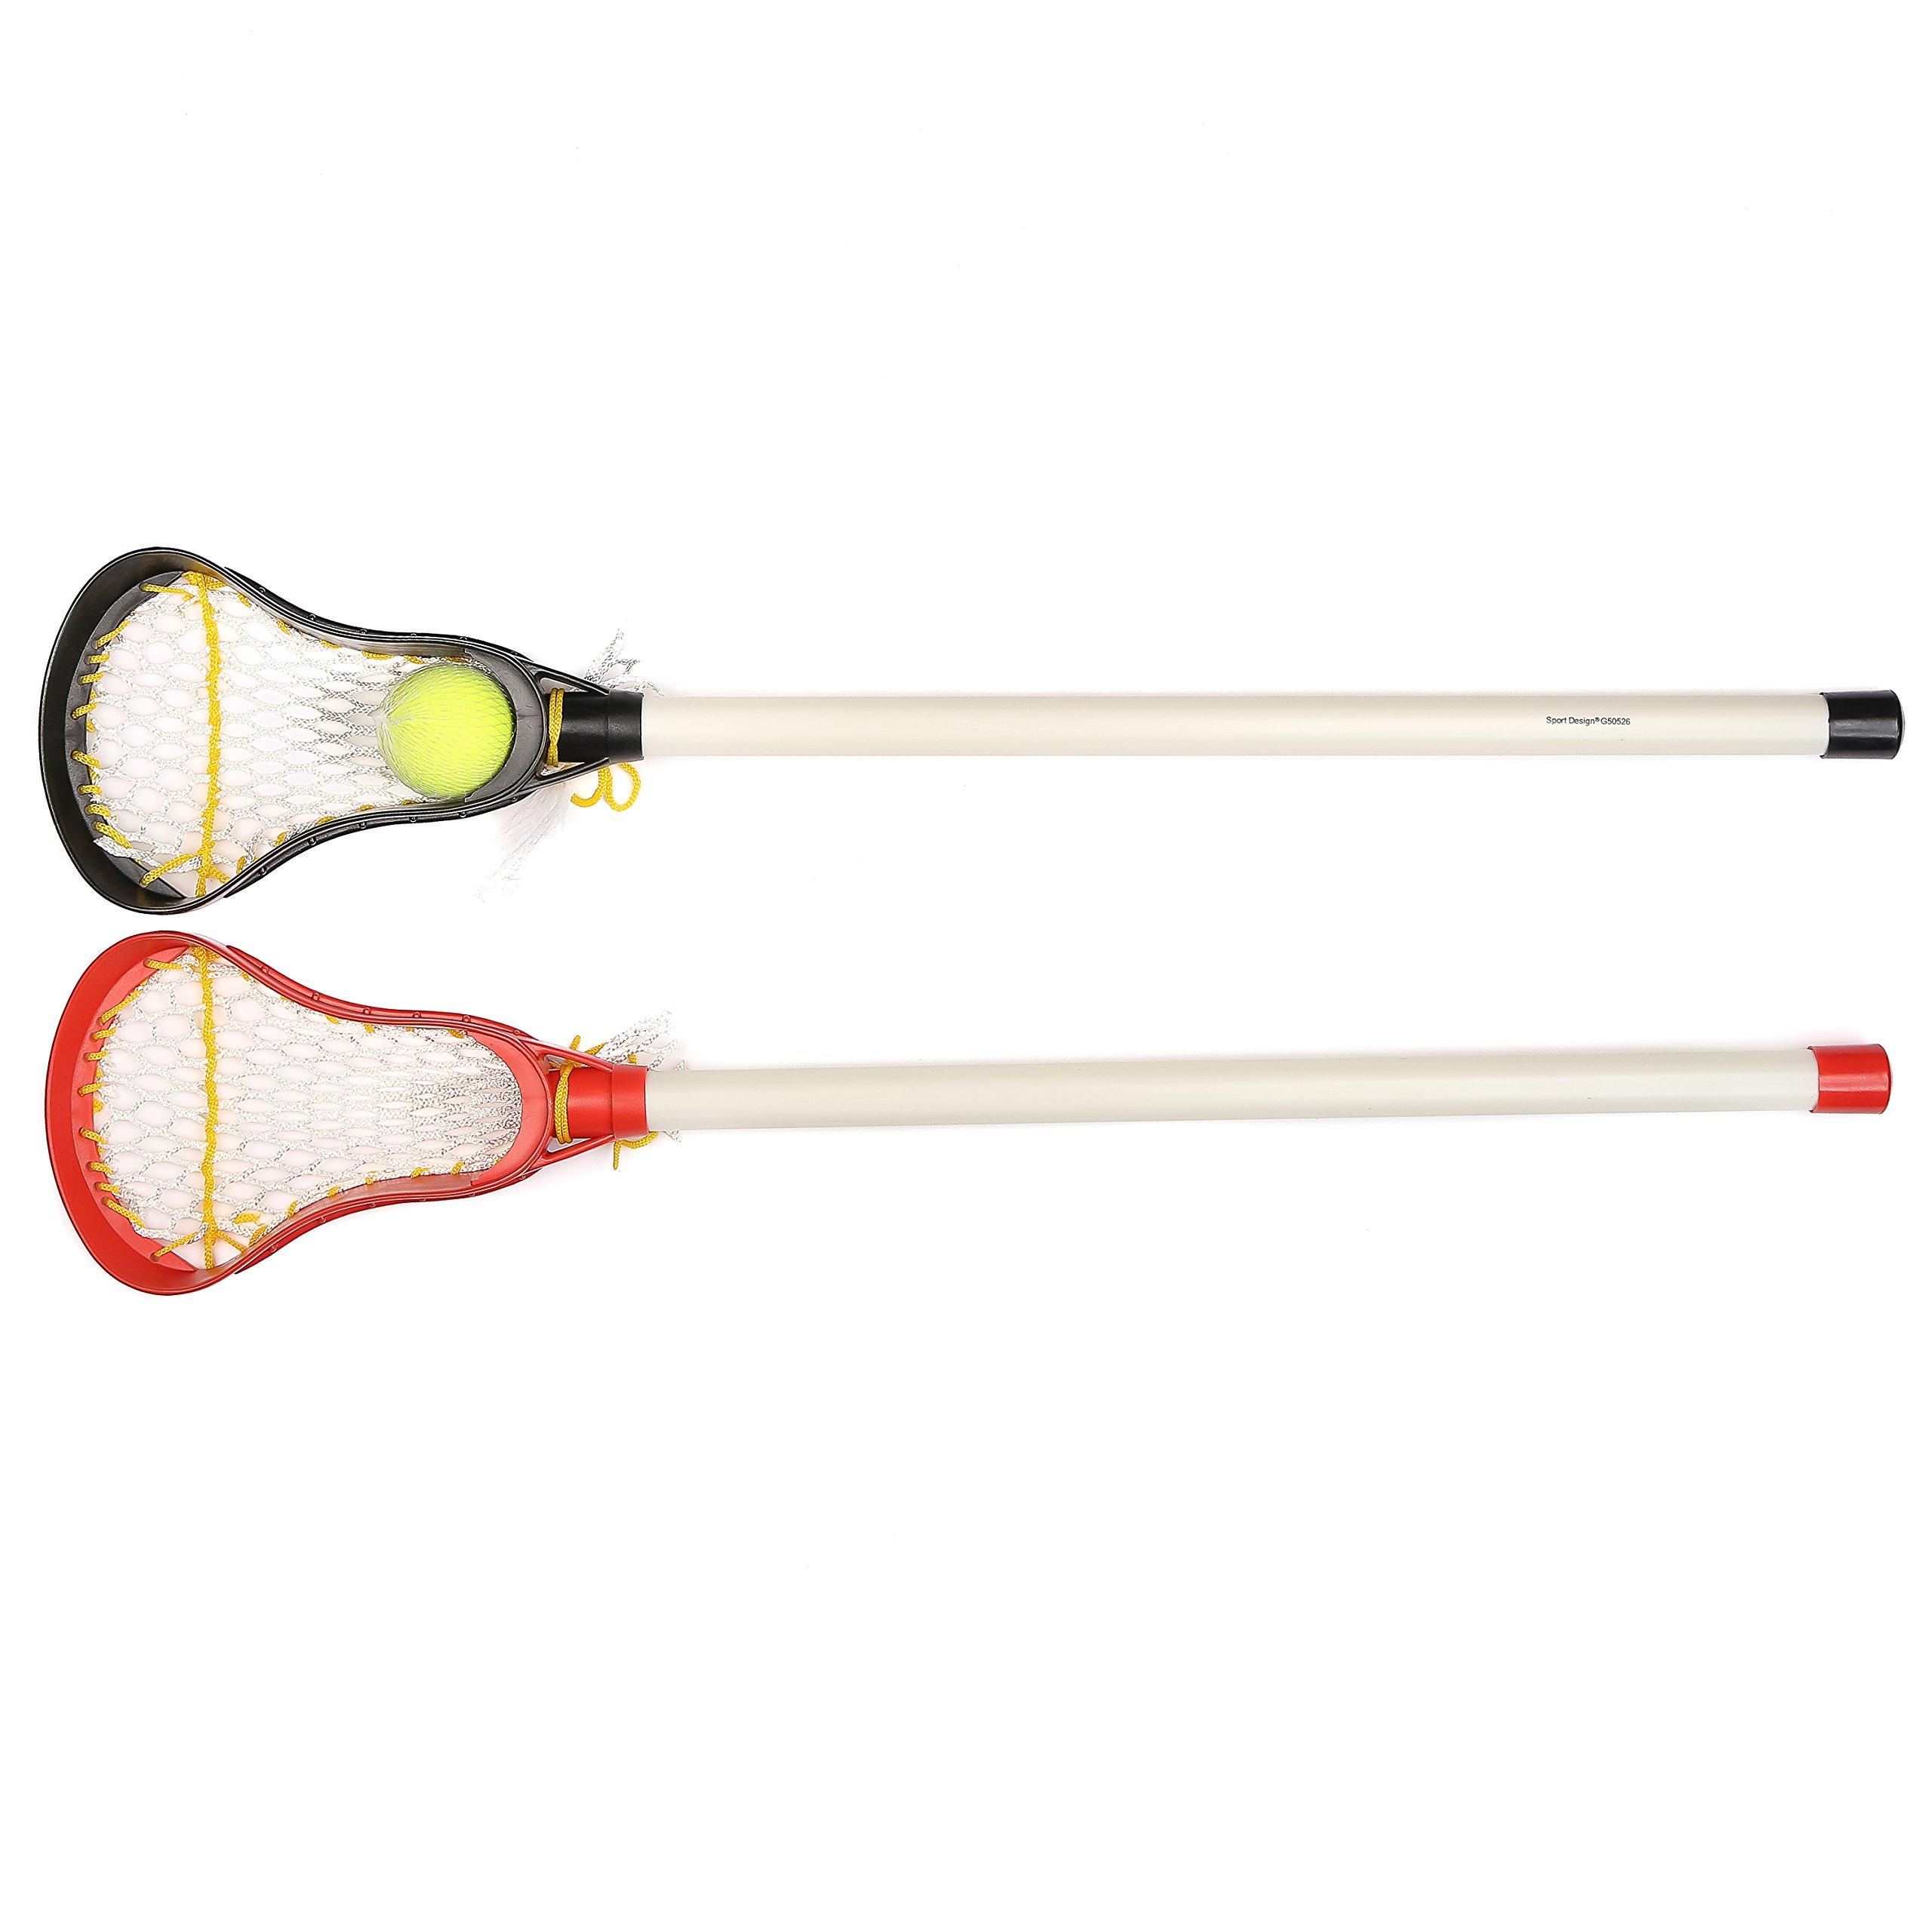 Kids Lacrosse Sticks - 2 Sticks (30 Inches) & 1 Ball - Soft Mesh Pockets, Durable Plastic Handles, & Large Head Design by Junior Lacrosse (Image #4)